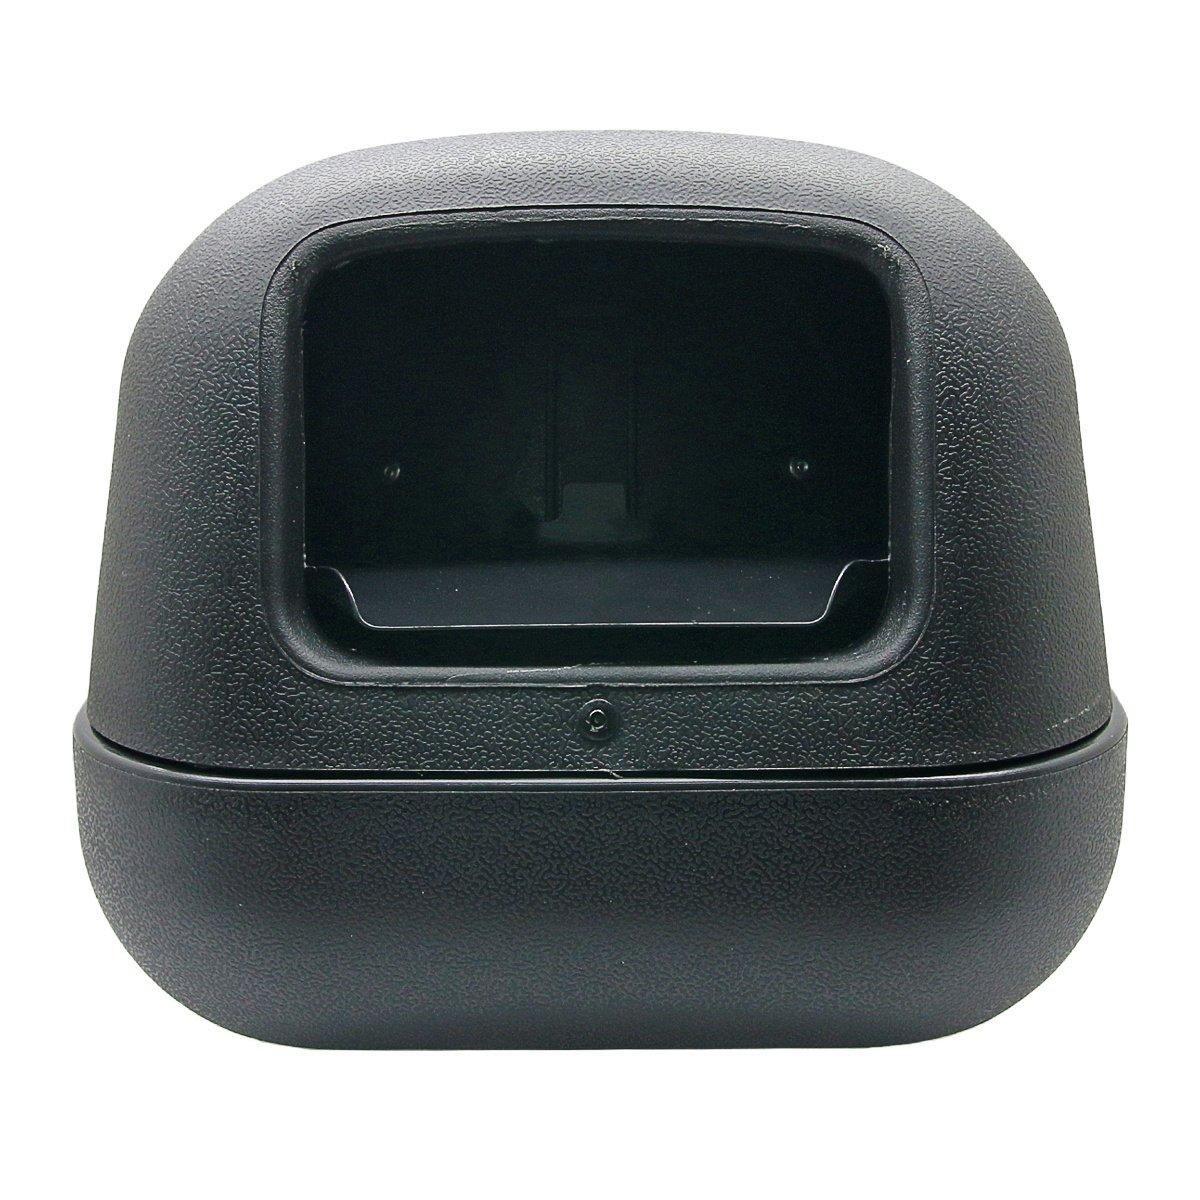 85mm 3.5 inch Snorkel Head Square Mushroom Head Air Flow Intake Replacement 4x4 4WD